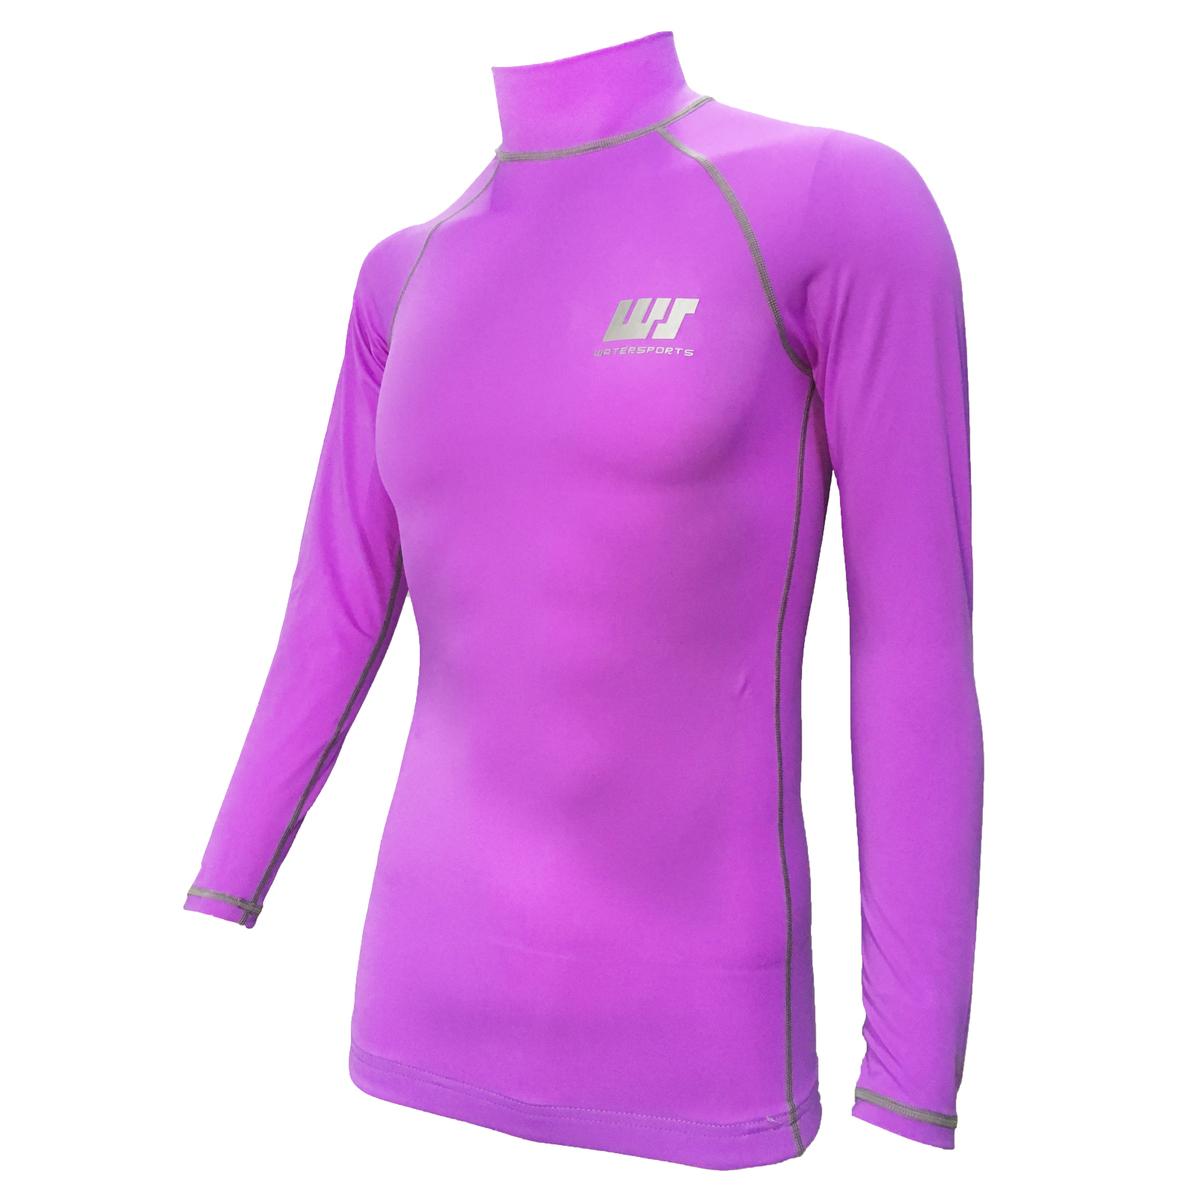 Adult's Sun Protection Top - Purple